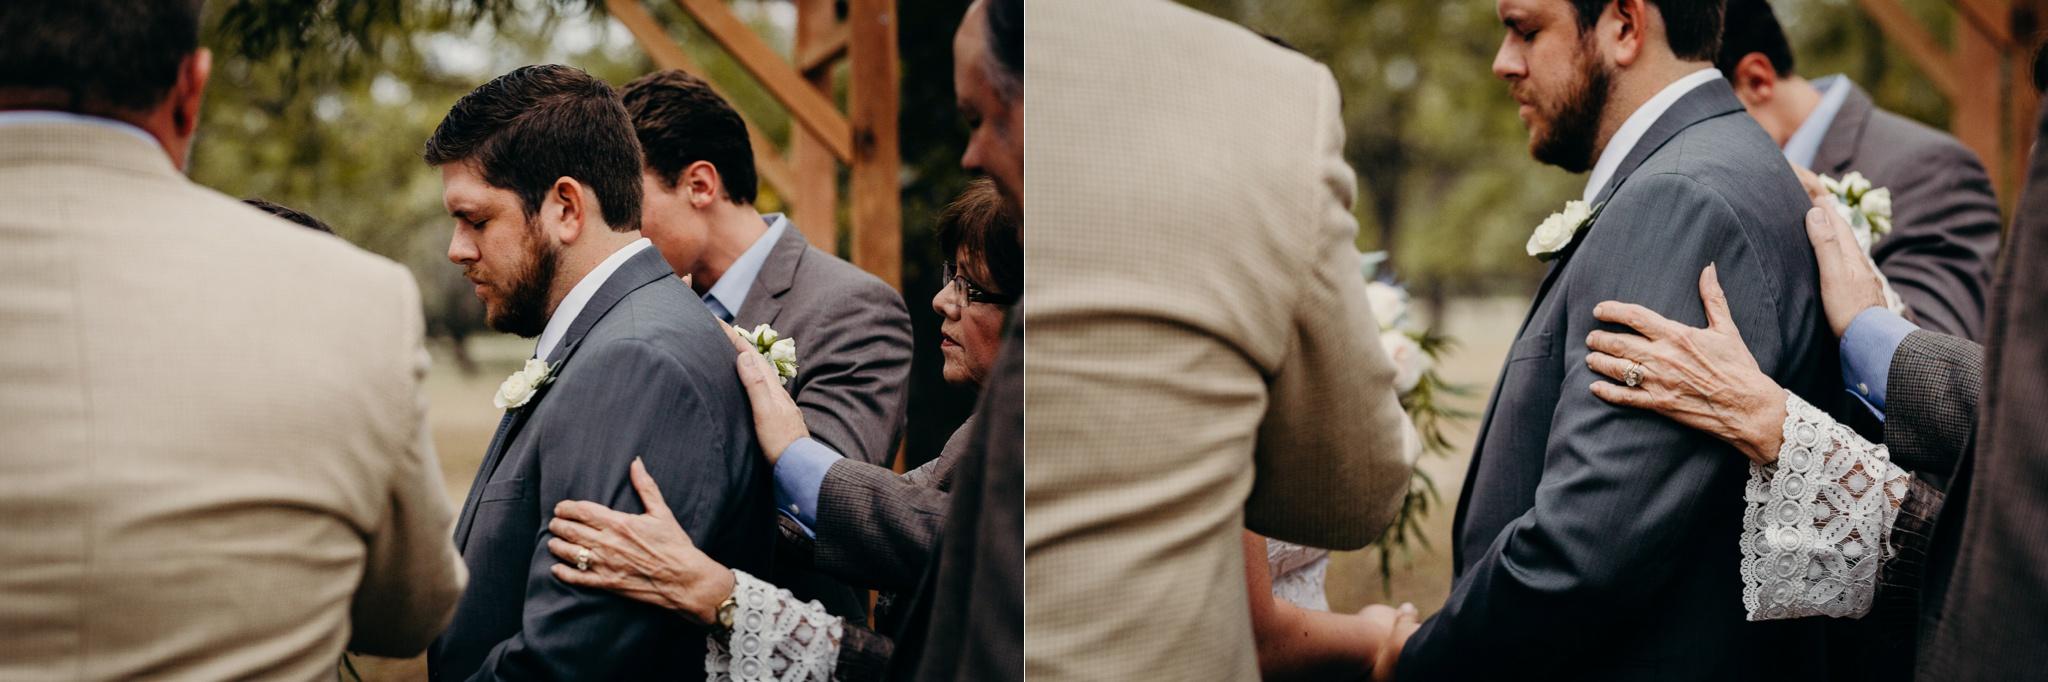 Carlson_Wedding_KaliMikelle-59.jpg